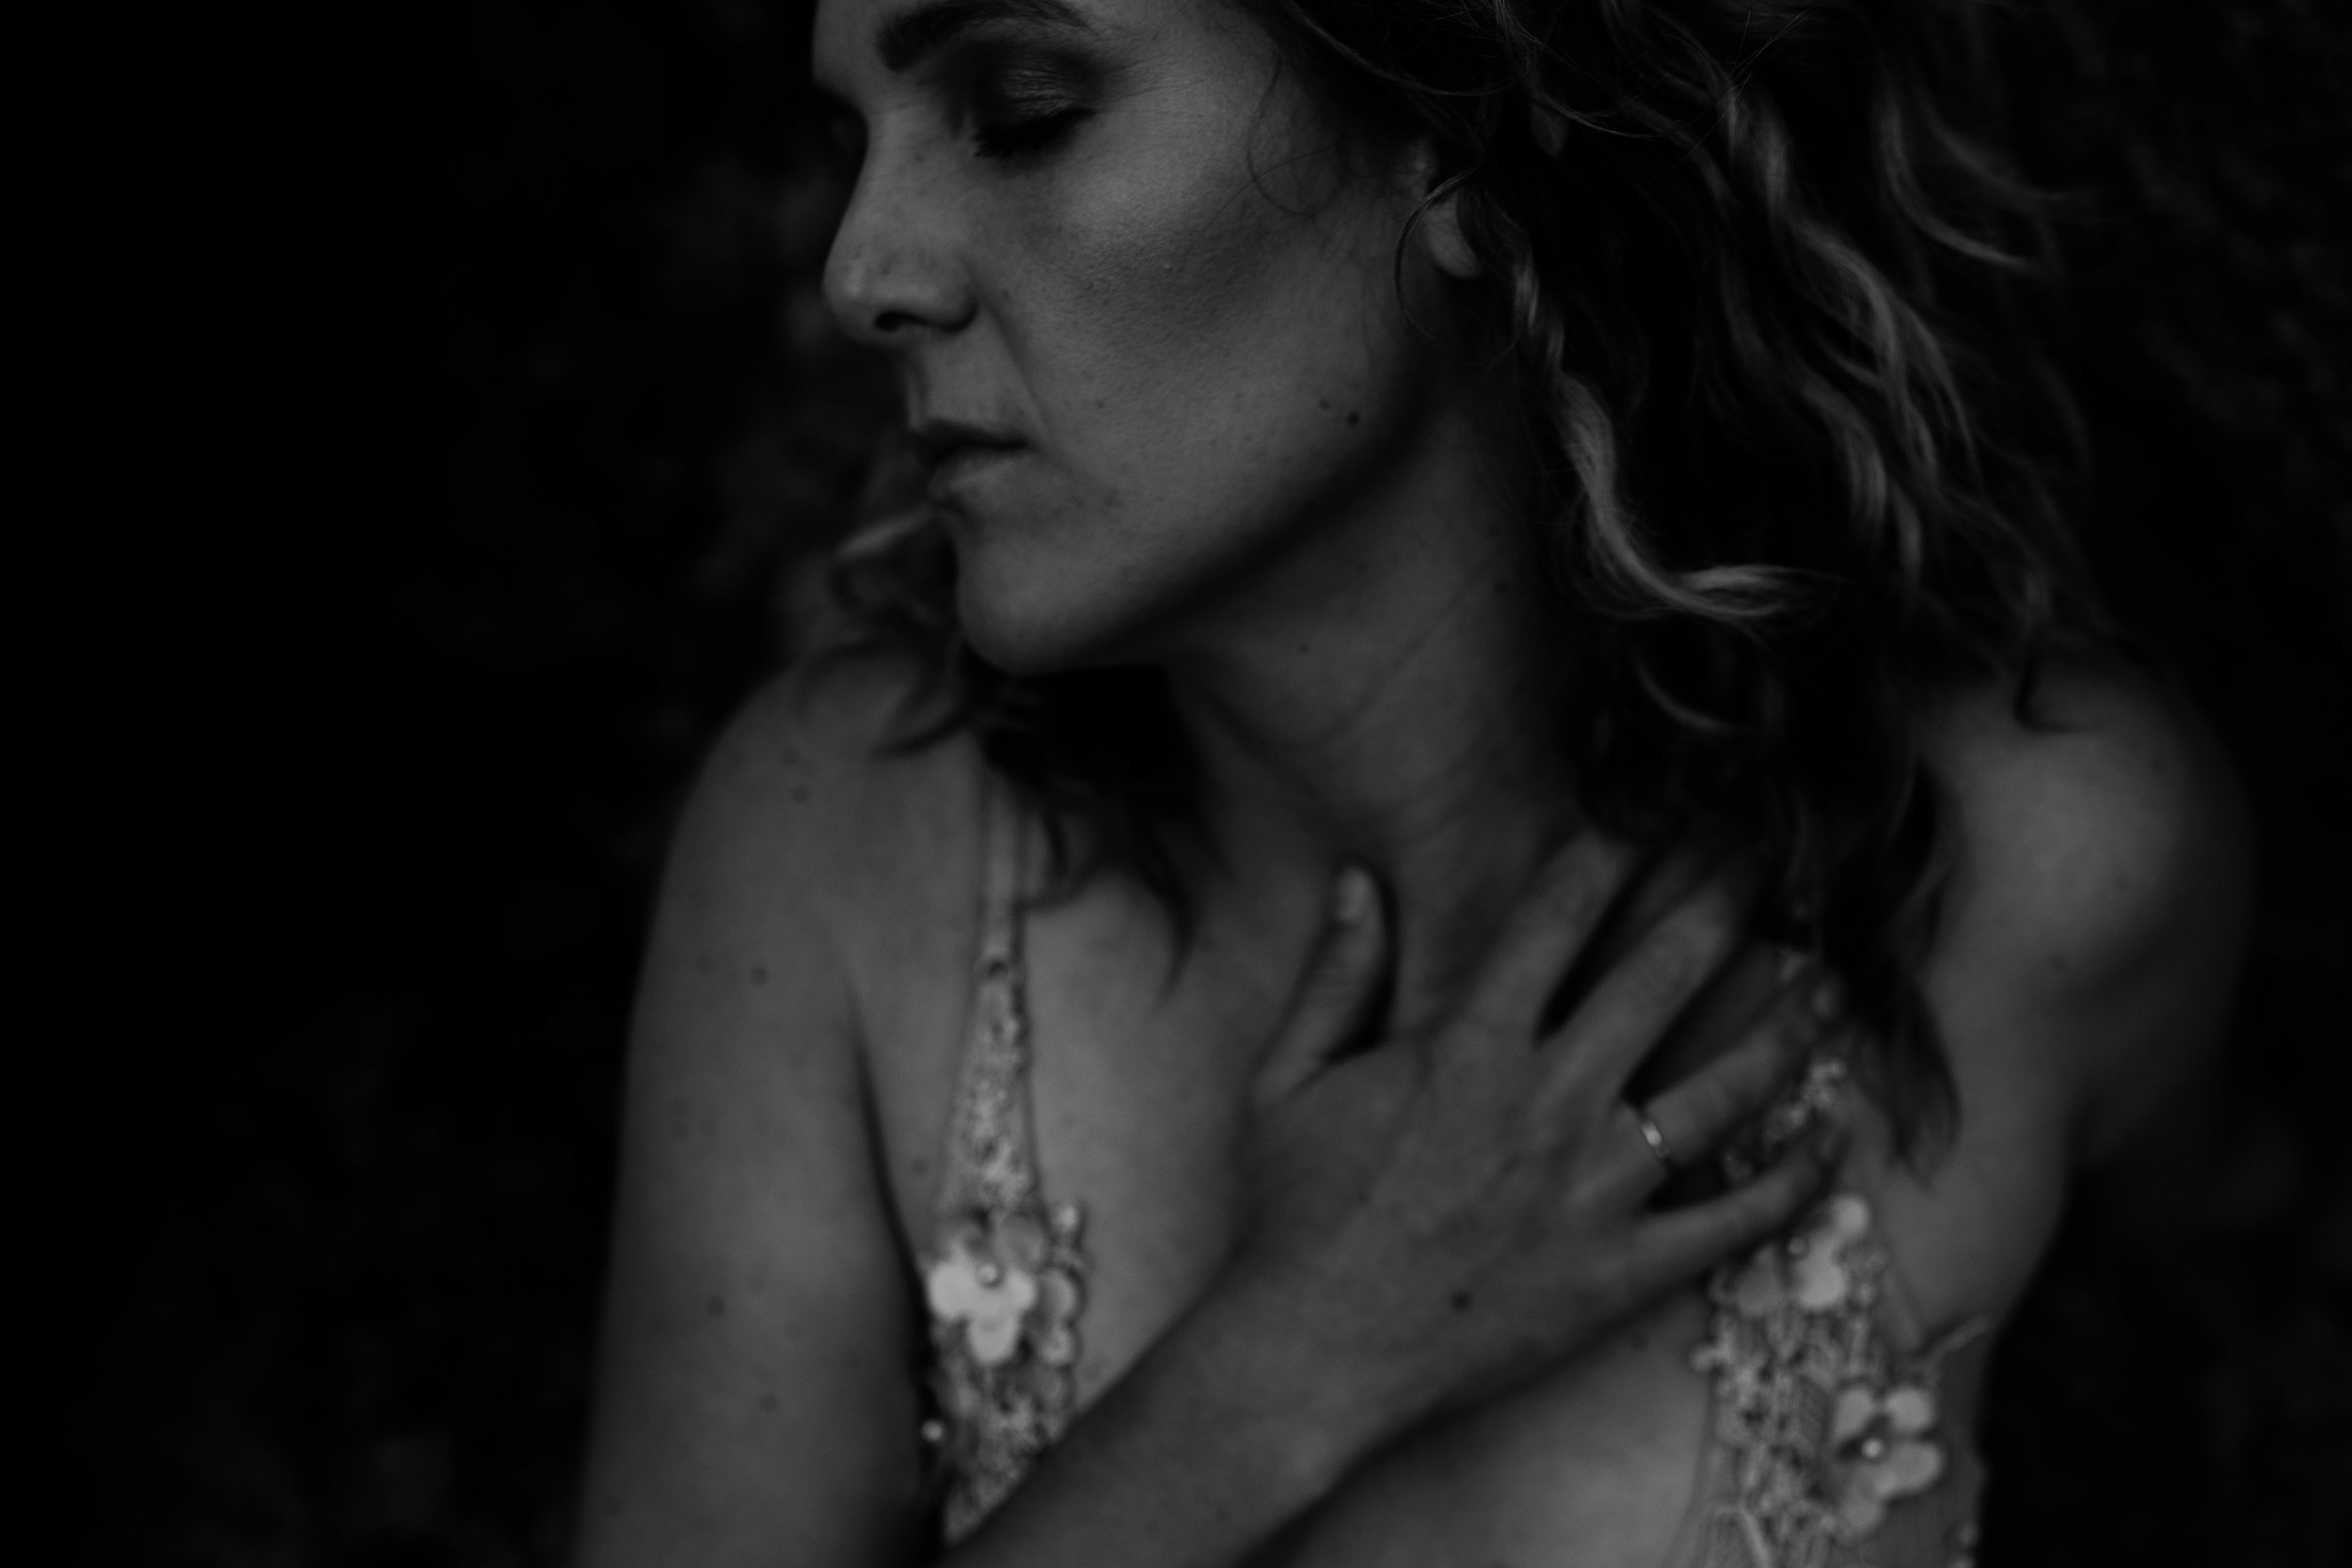 colorado-boudoir-photographer-vedauwoo-soul-session-jessica-max-137.jpg